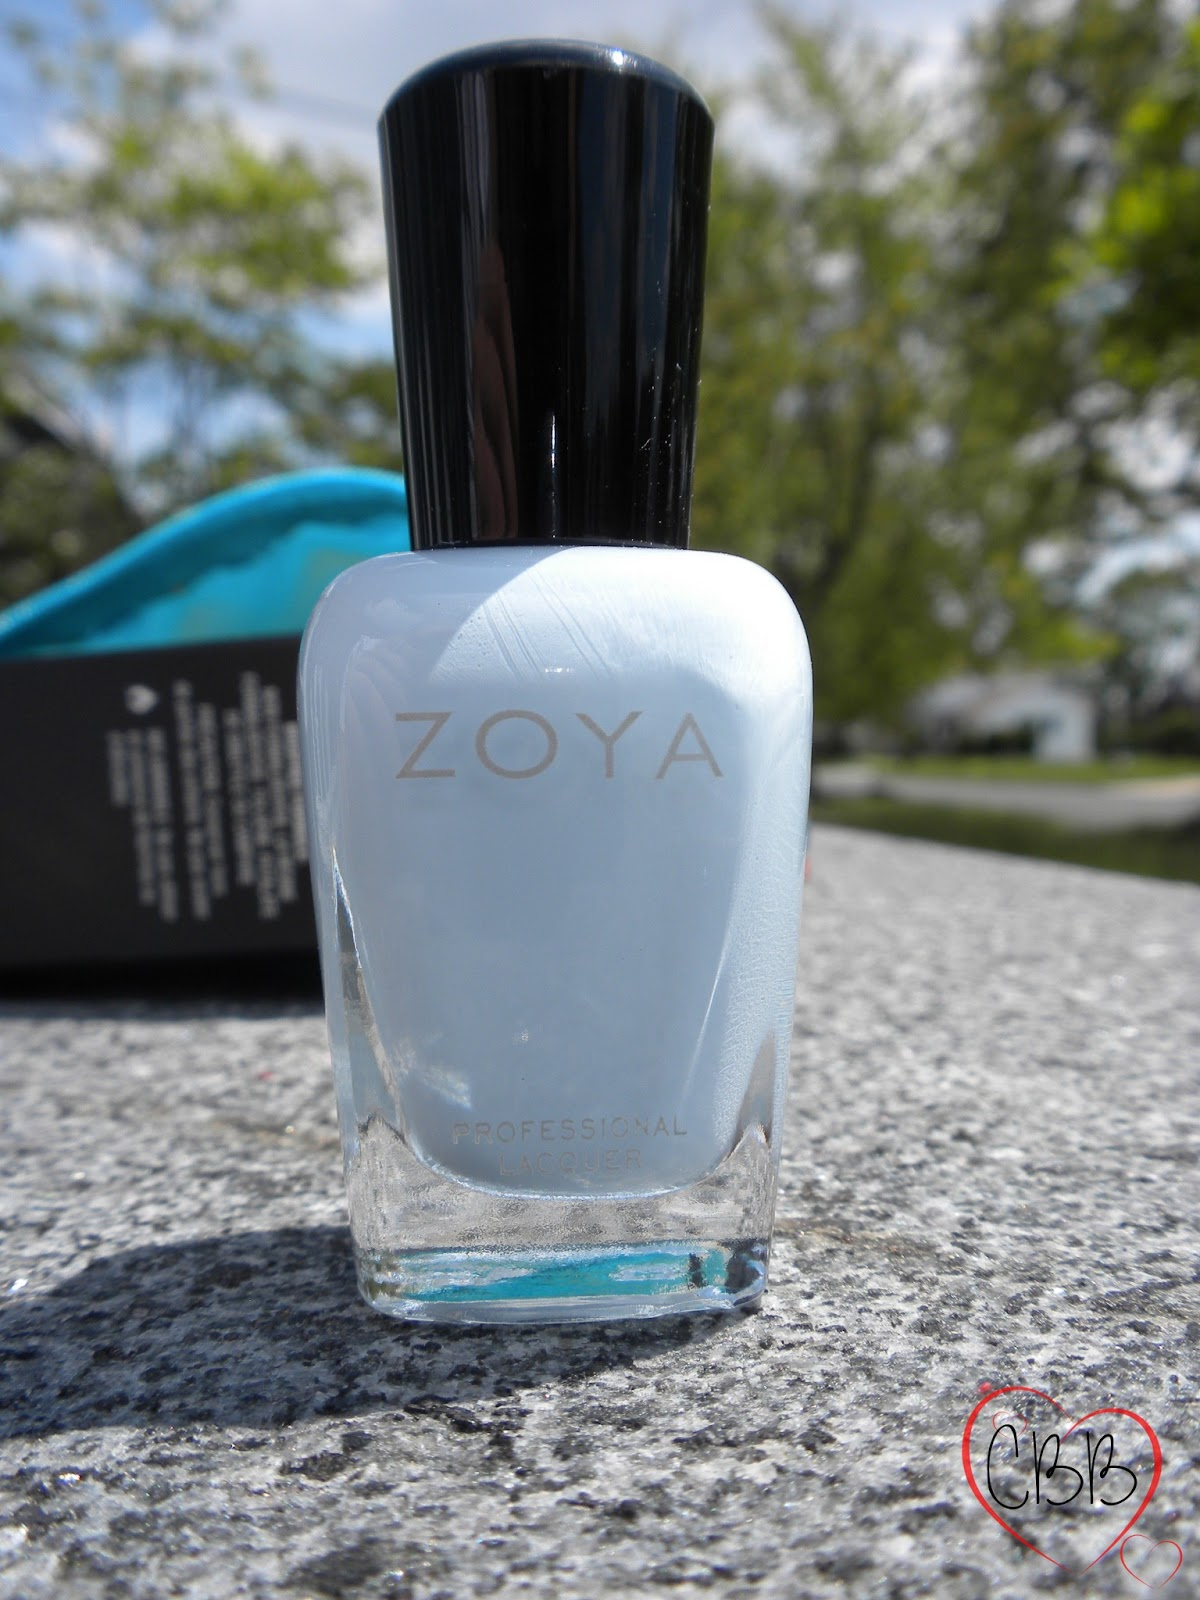 Sammi the Beauty Buff: Review: Zoya Nail Polish in Blu